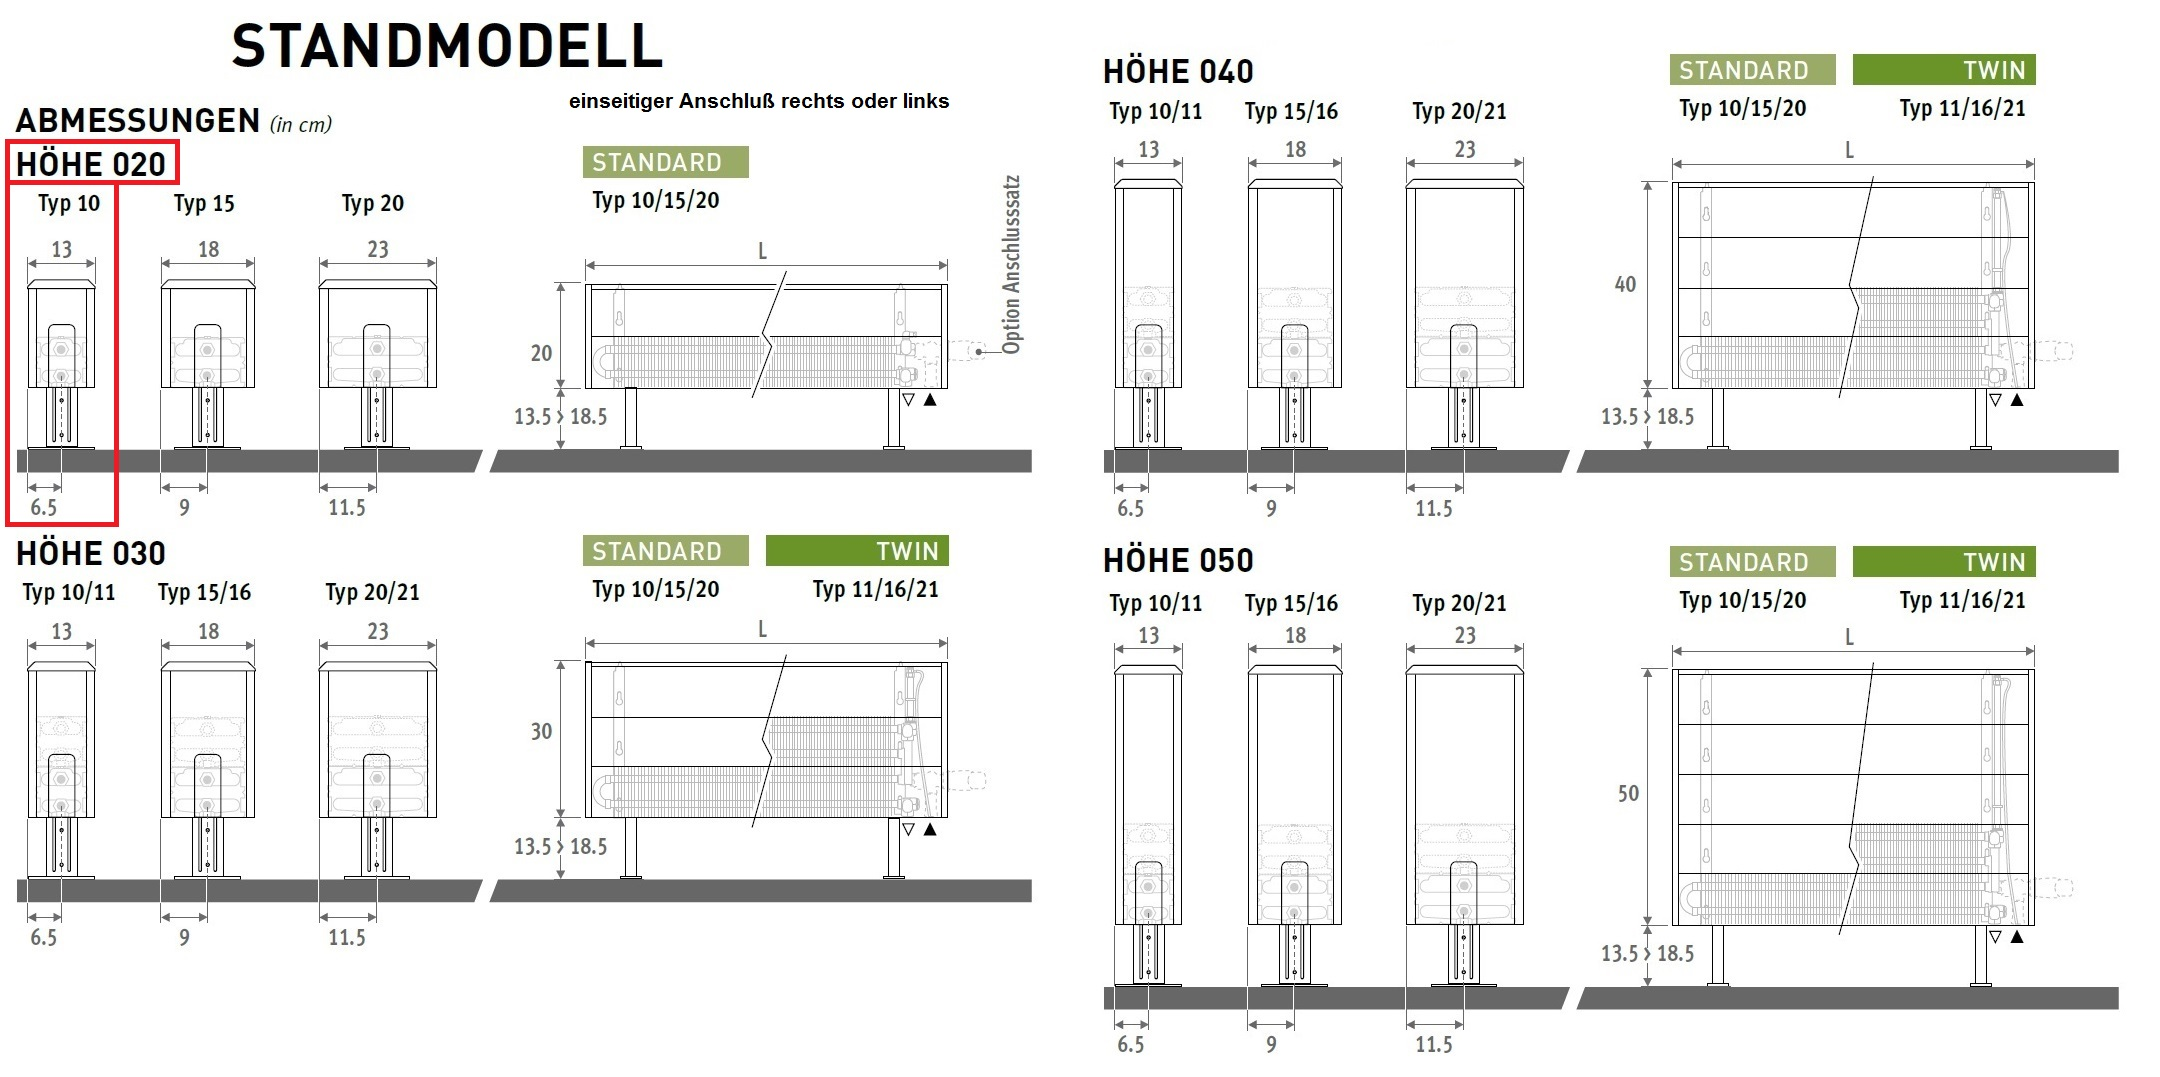 freistehende heizk rper 20 cm hoch standheizk rper f r. Black Bedroom Furniture Sets. Home Design Ideas